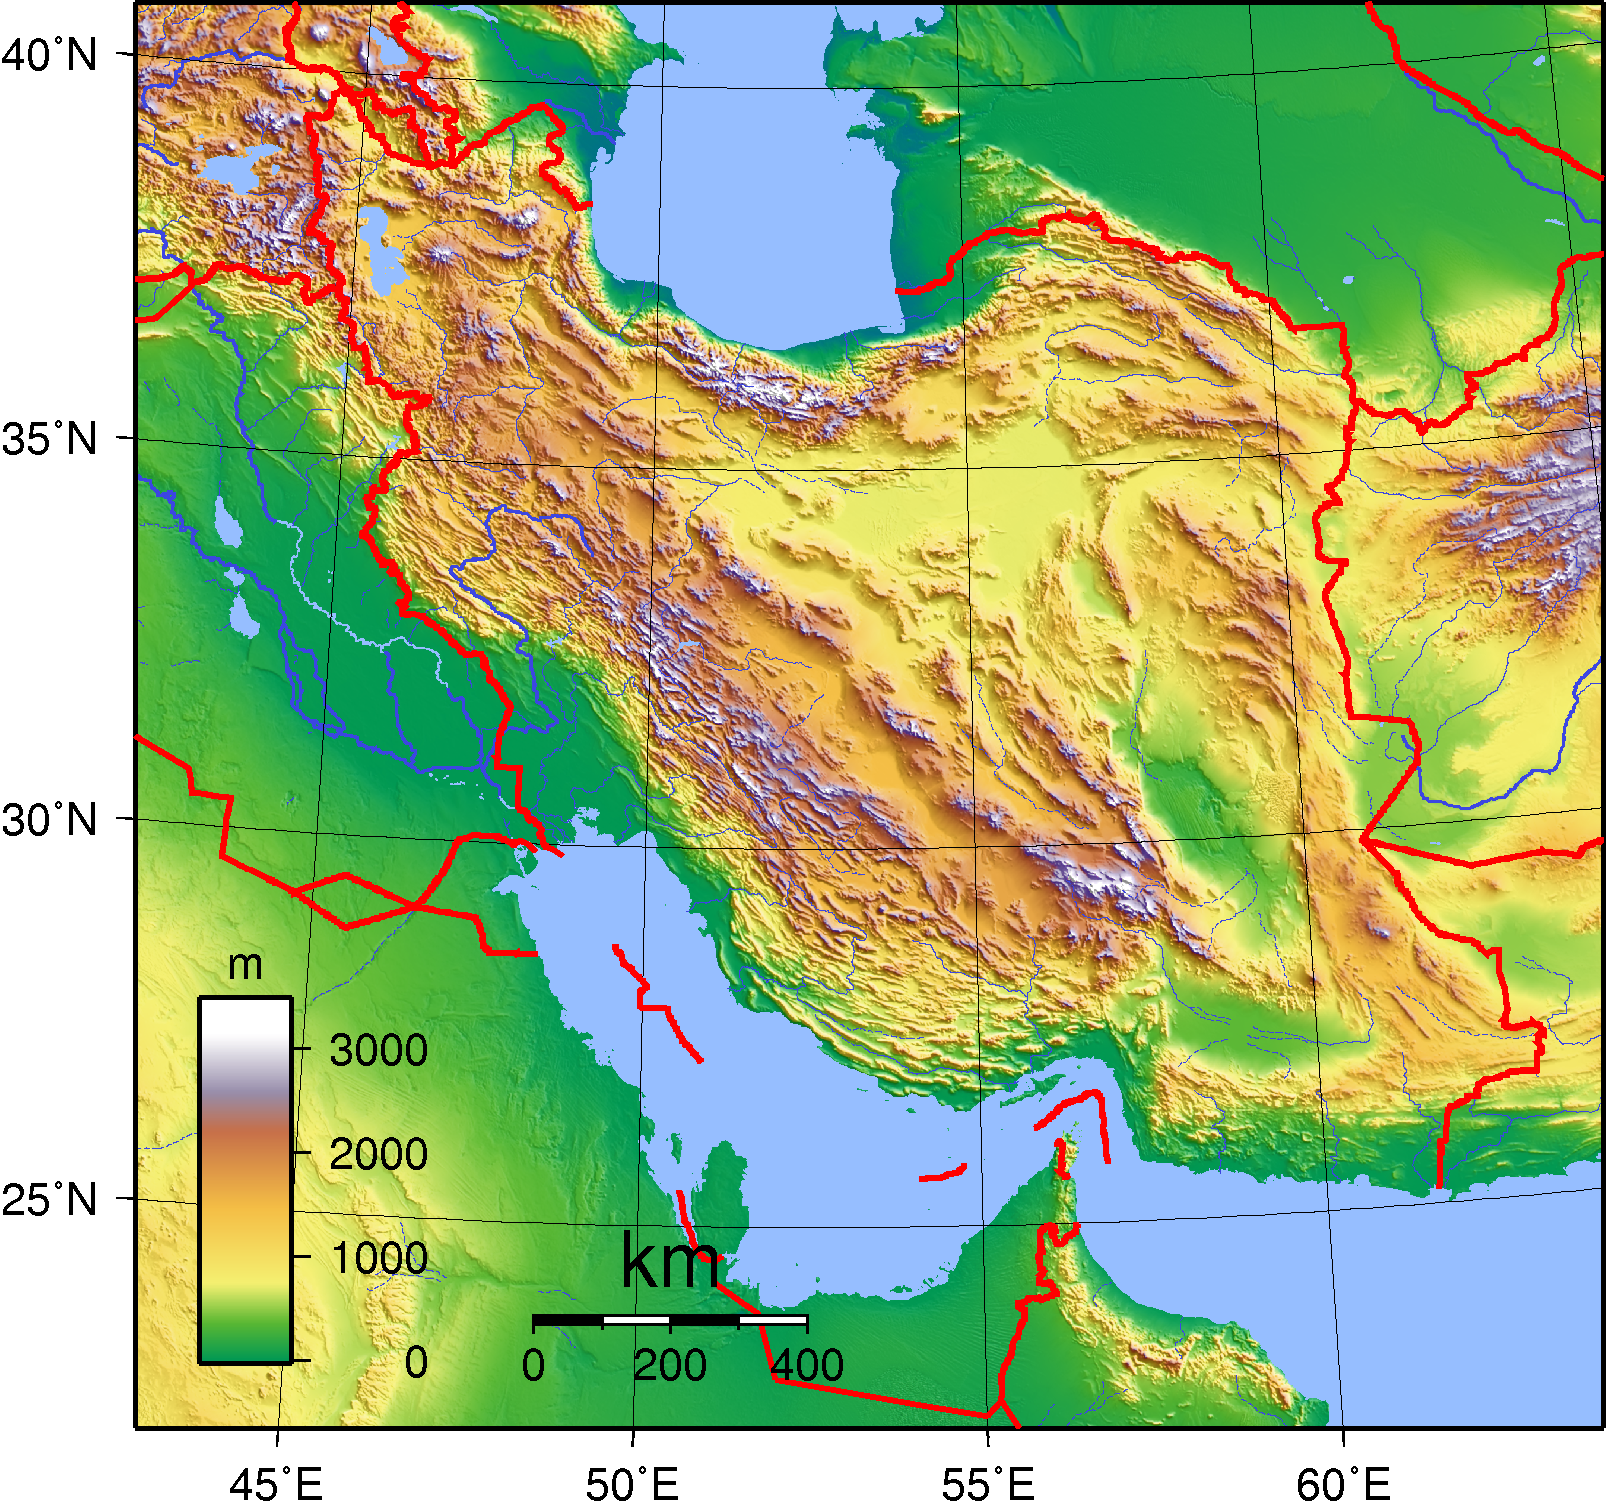 Iran_Topography